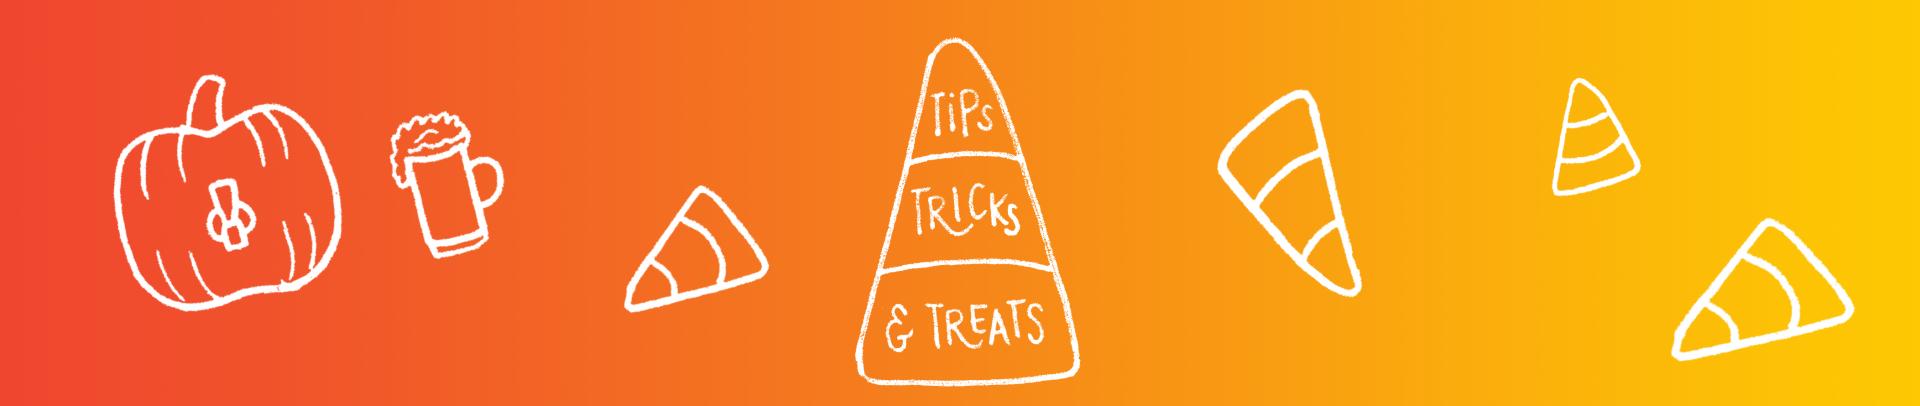 OE Halloween Tips, Tricks and Treats